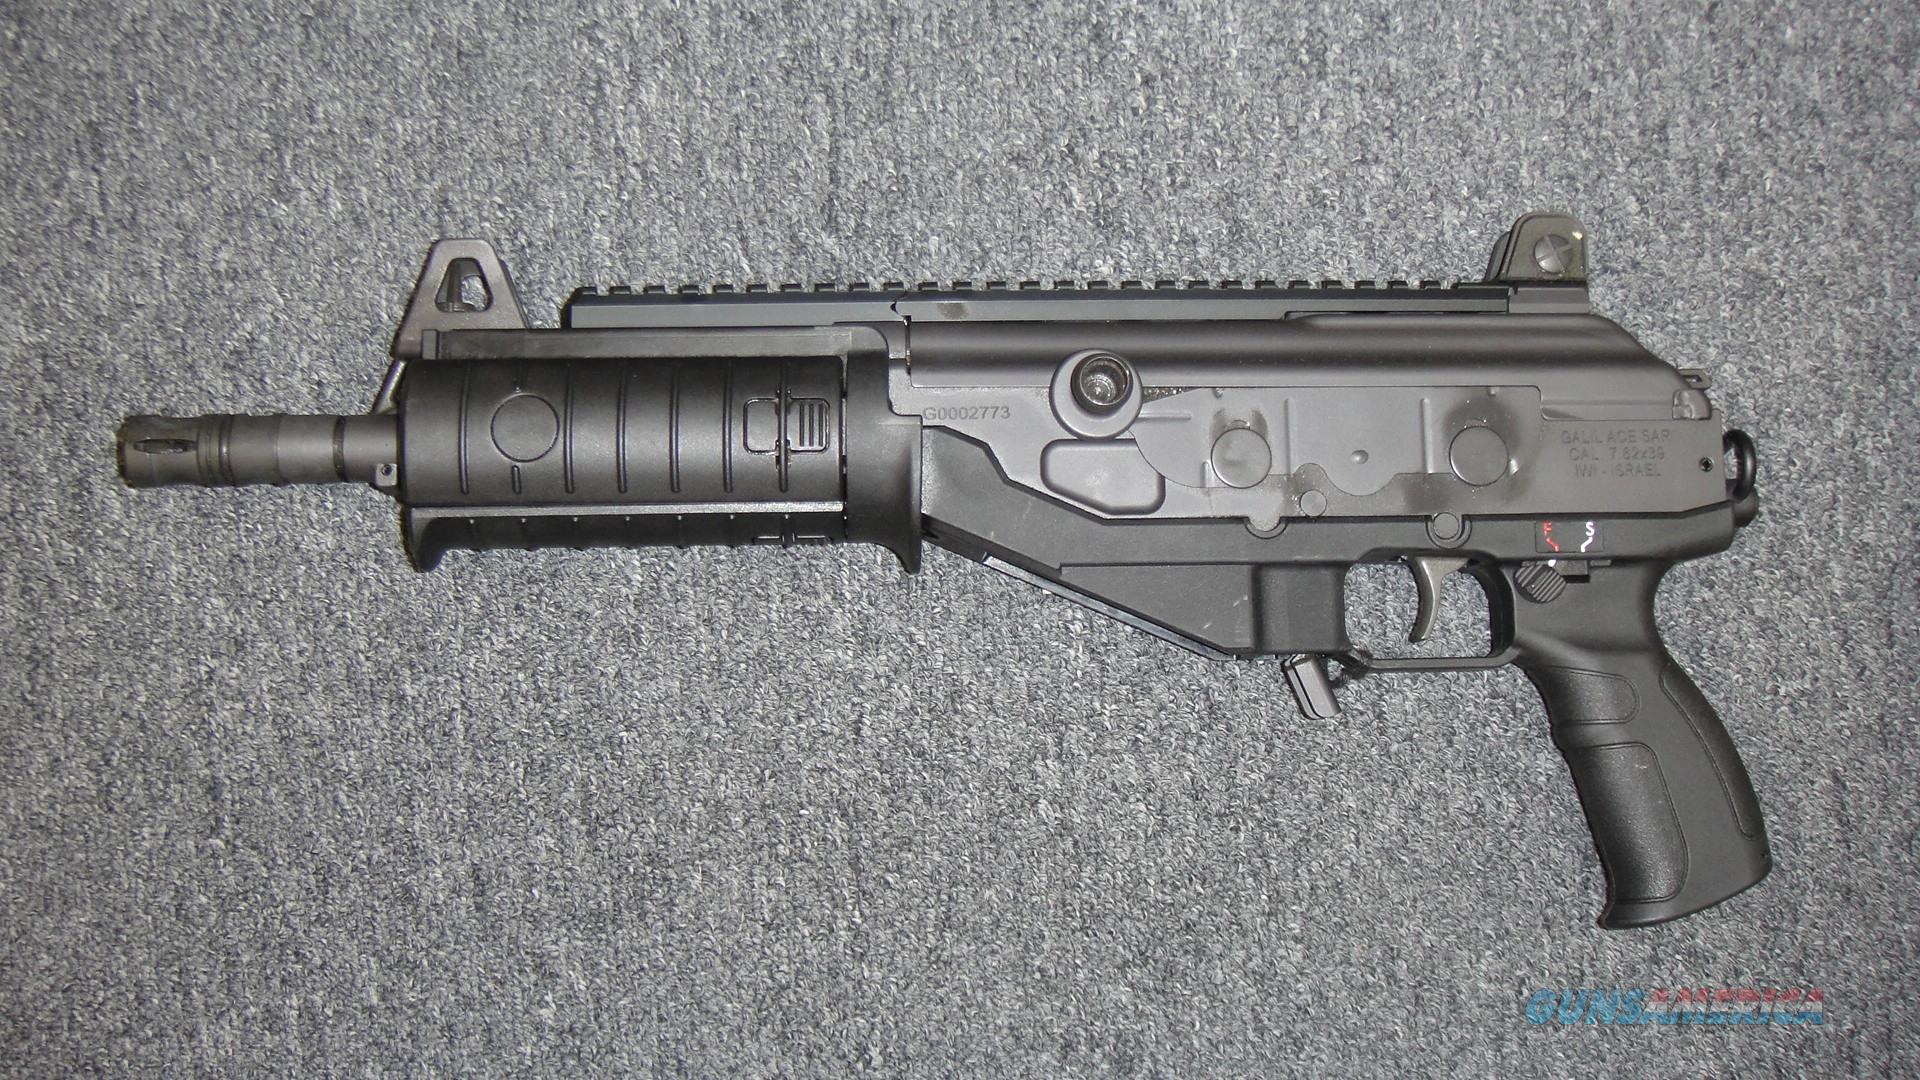 IWI Galic Ace SAR Pistol  Guns > Pistols > IWI Pistols